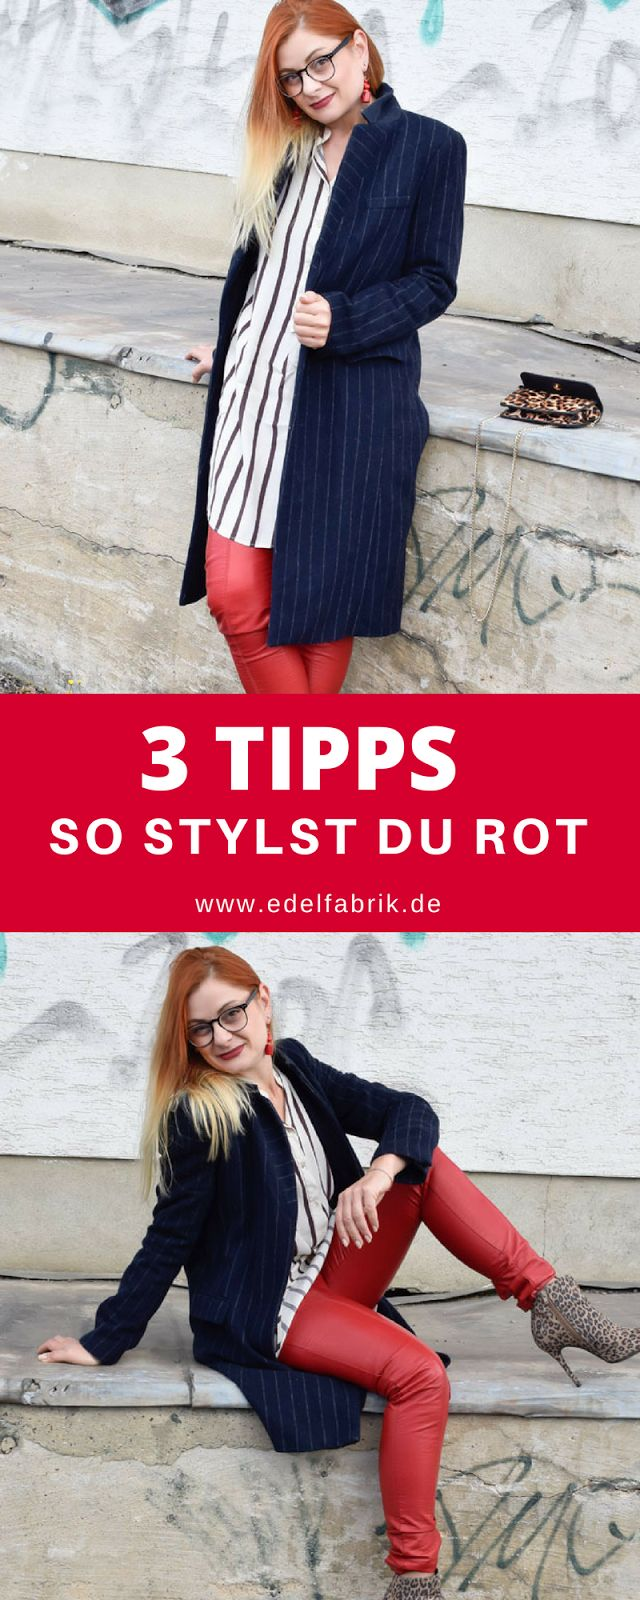 3 Tipps wie Du Rot richtig stylst, Rote Lederhose